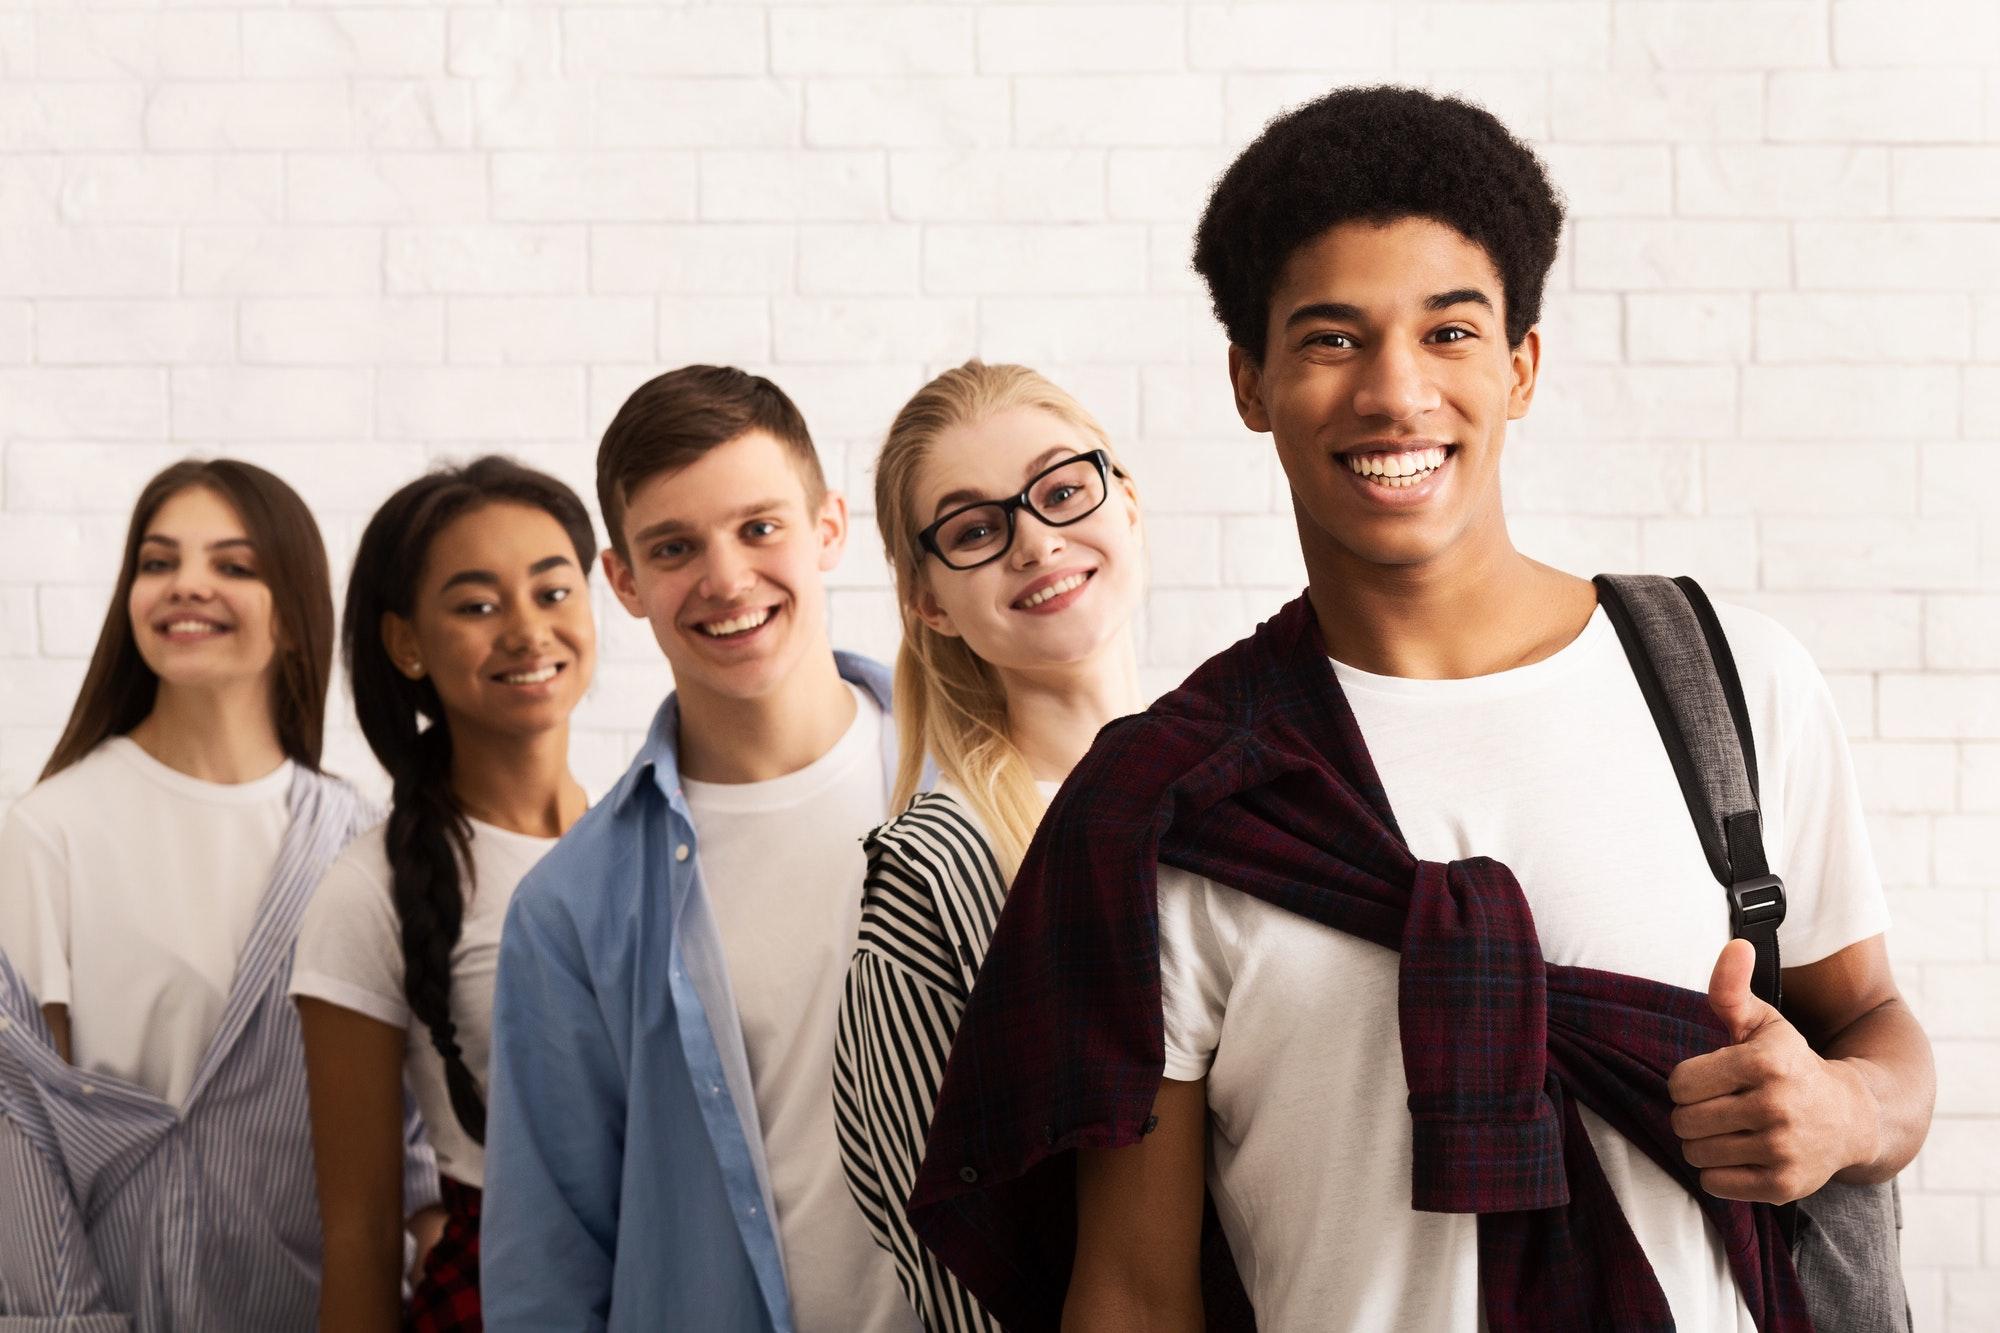 Teens and high blood pressure